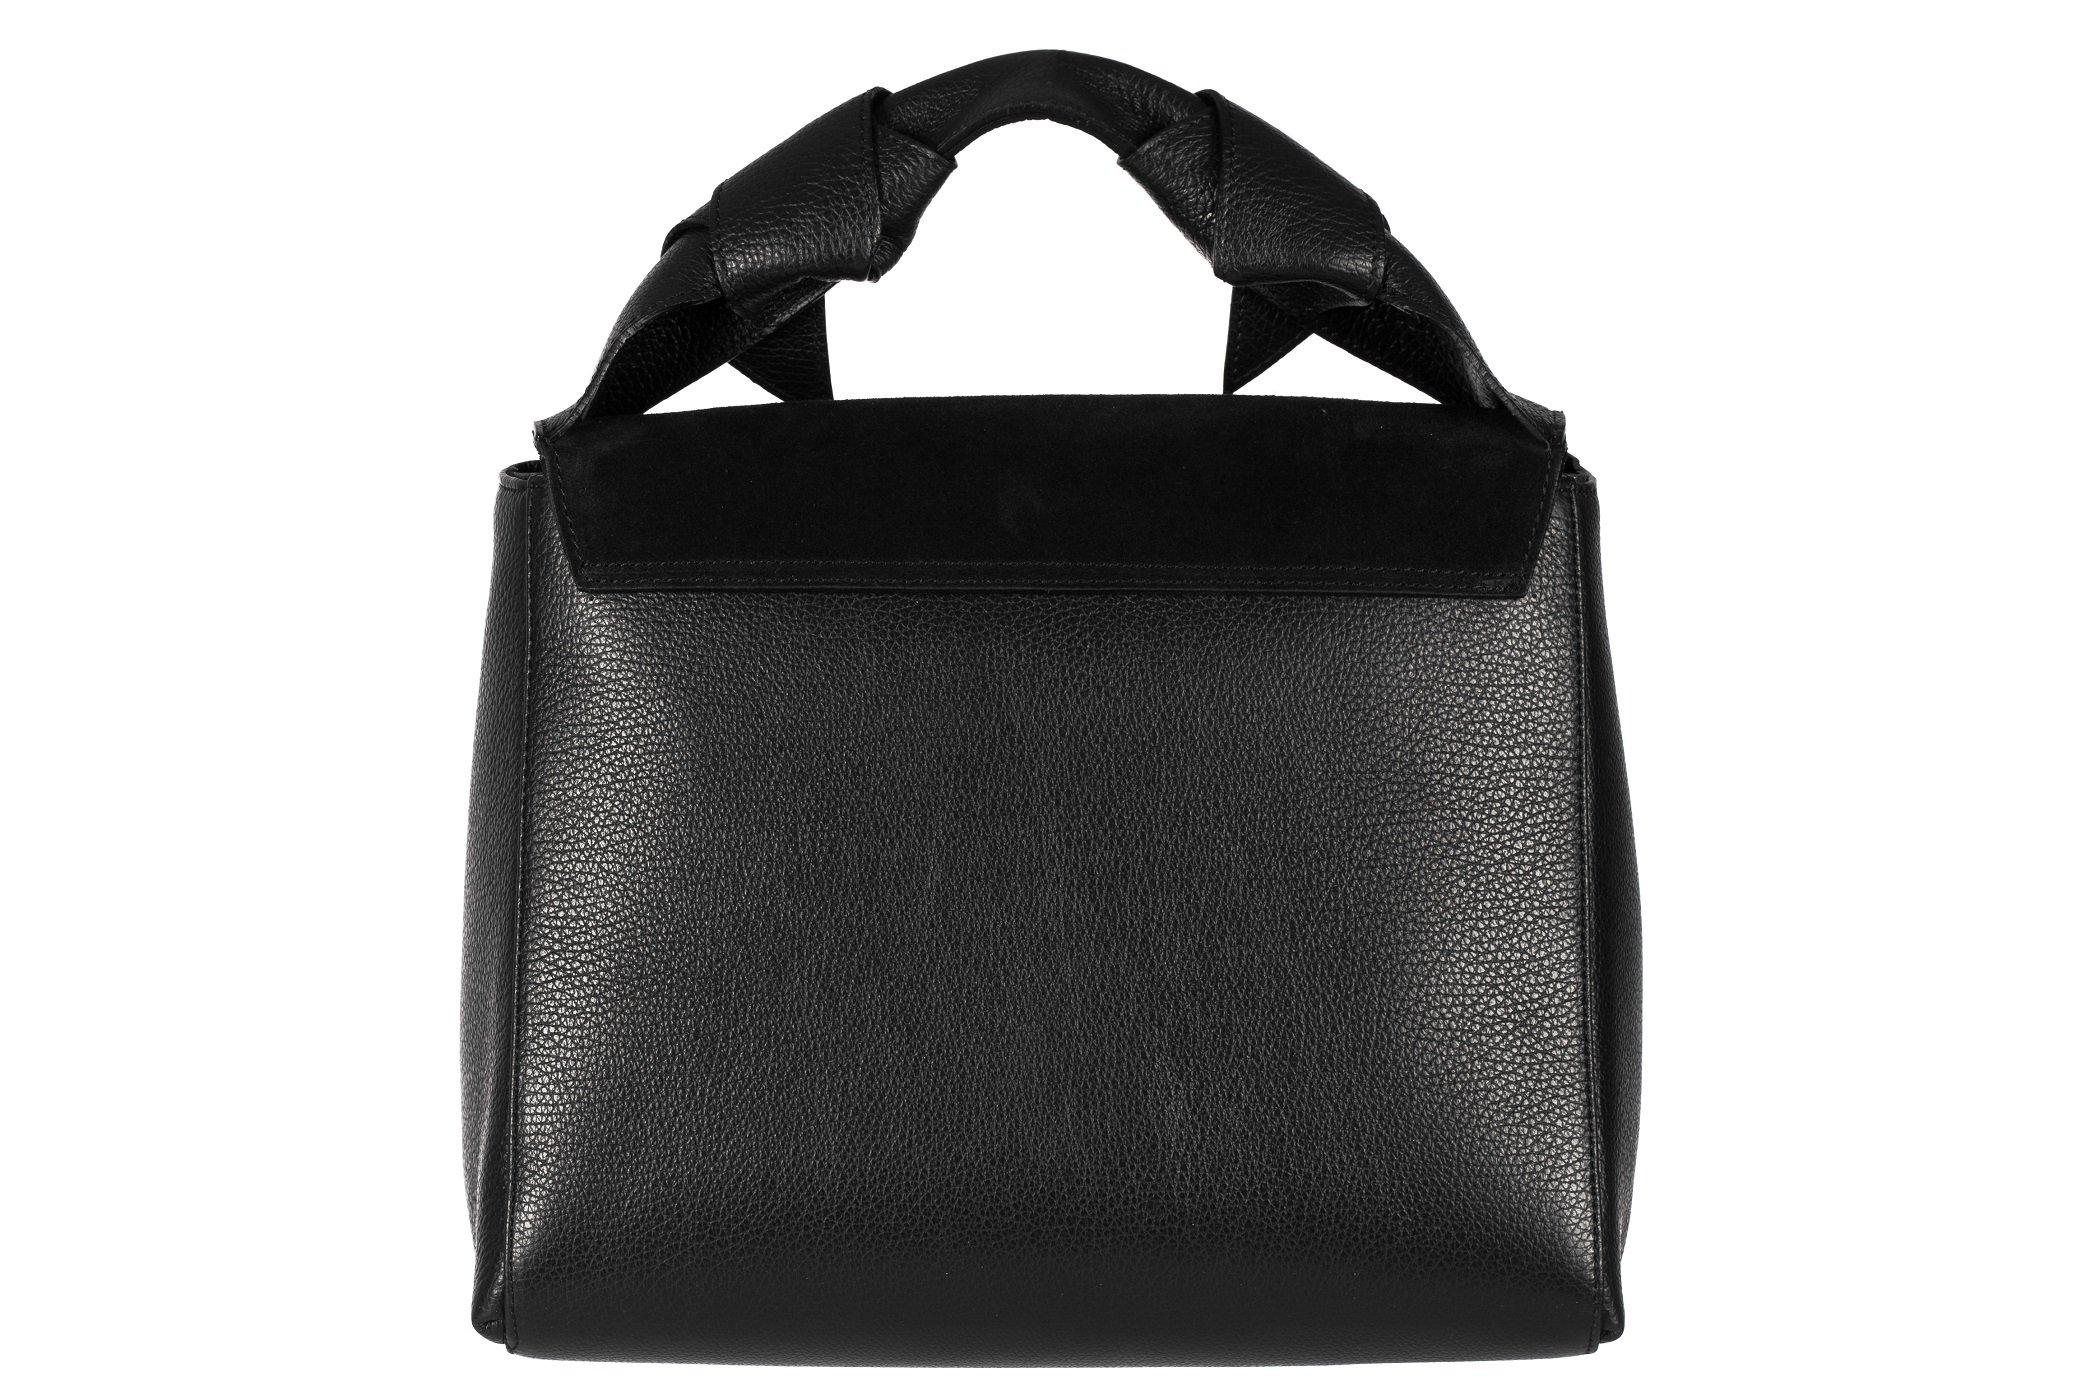 f57397ce3e49c Włoska skórzna torebka damska Vera Pelle, cena - sklep | MB CLASSIC BAG